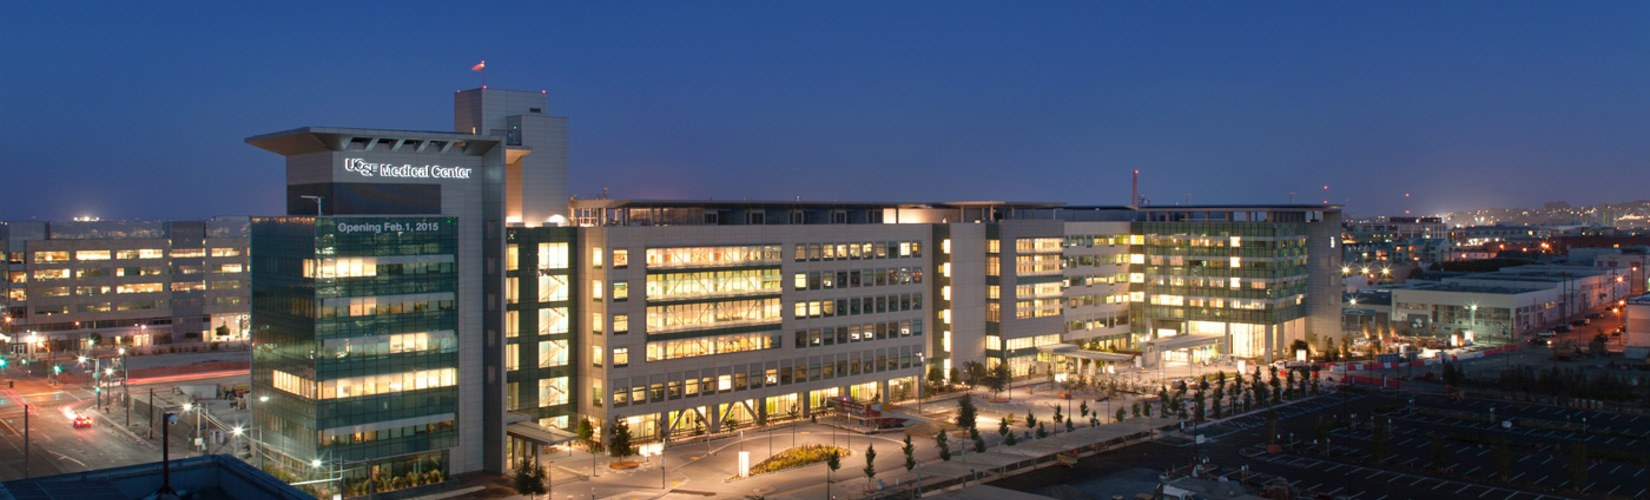 UCSF_Medical_Center_11_20_2014.jpg